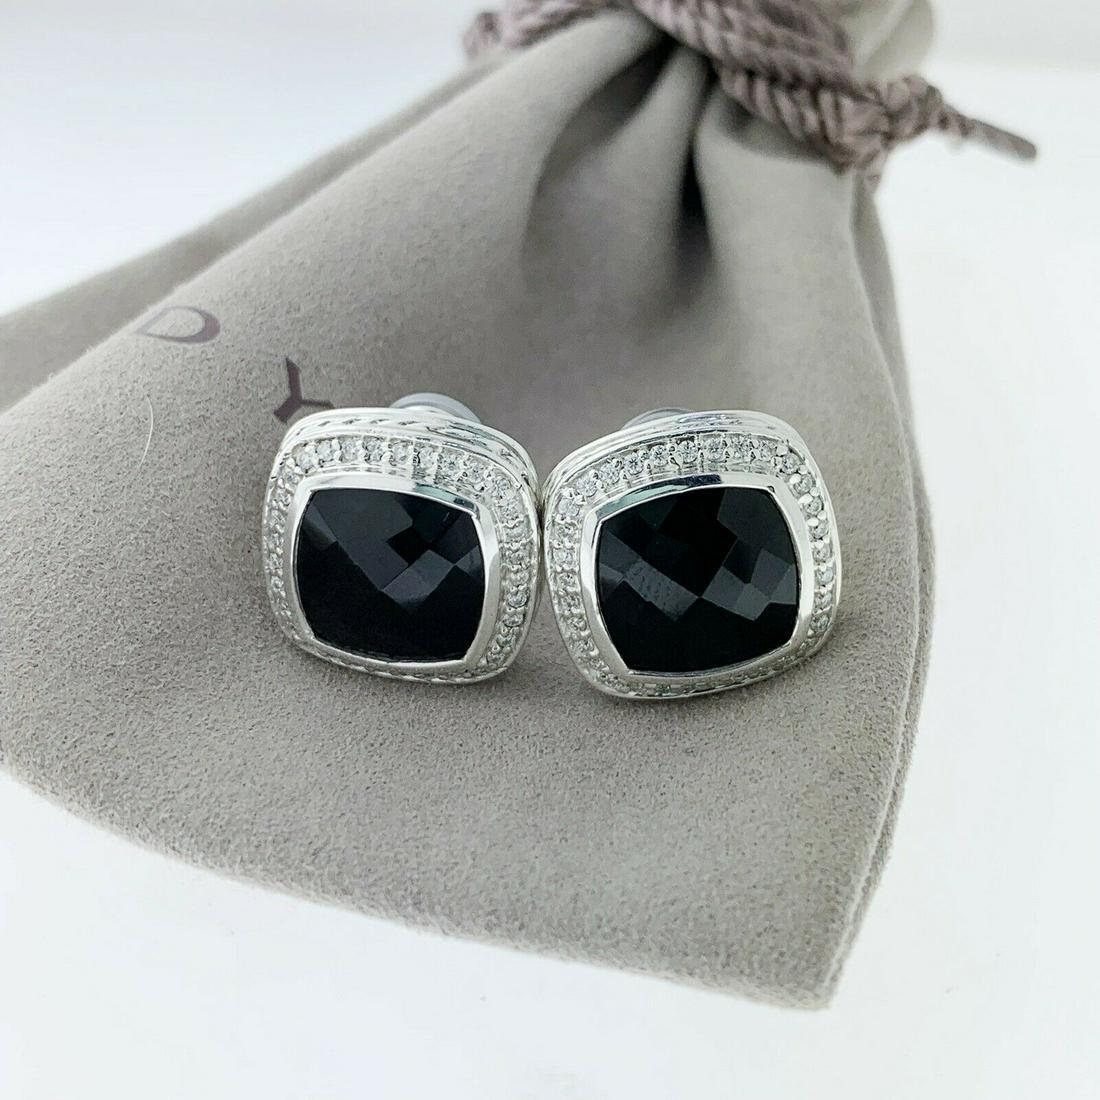 David Yurman Albion 11mm Black Onyx Diamond Earrings